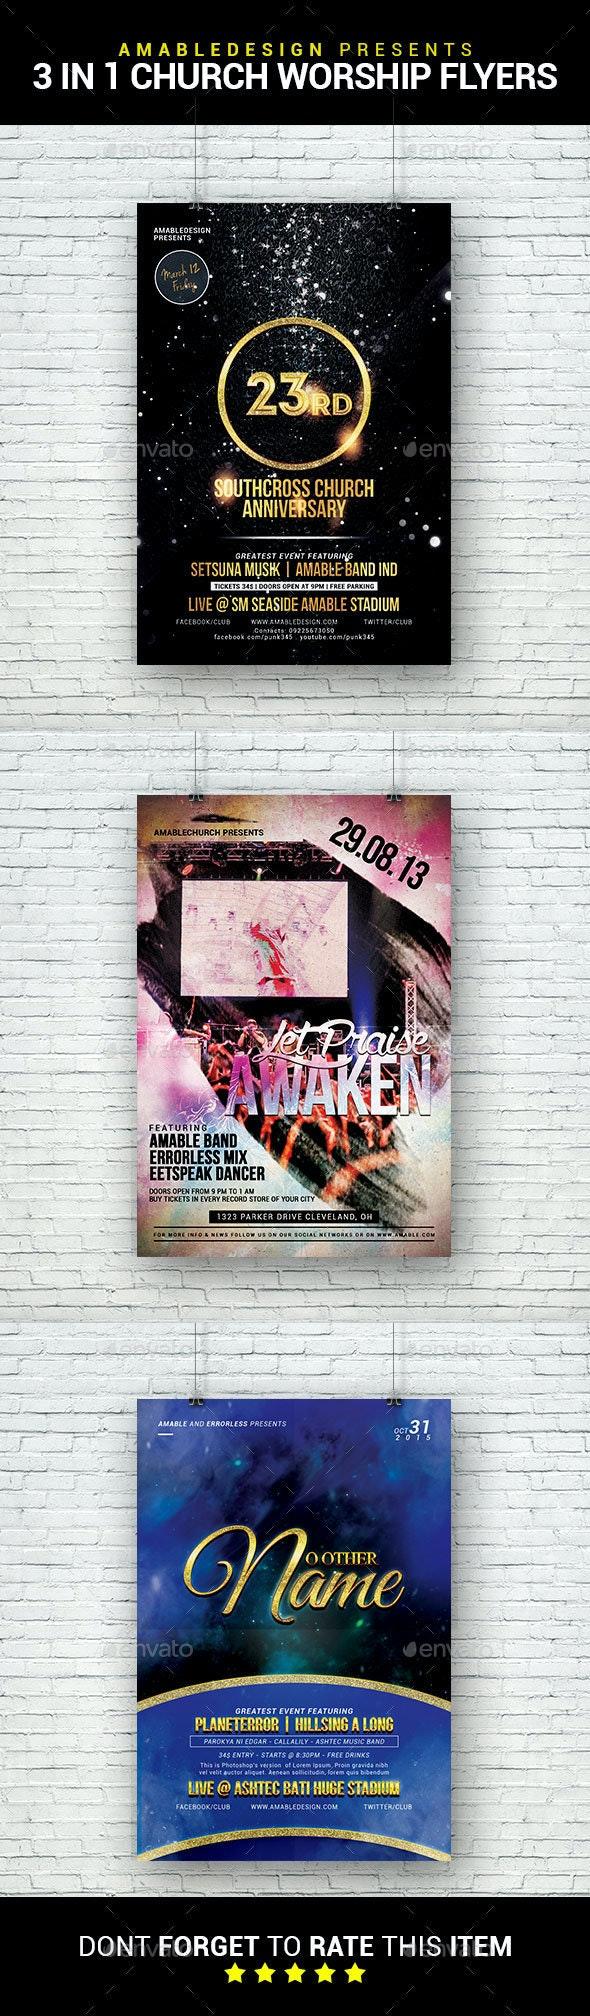 3 in 1 Church Worship Flyer/Poster Bundle - Church Flyers